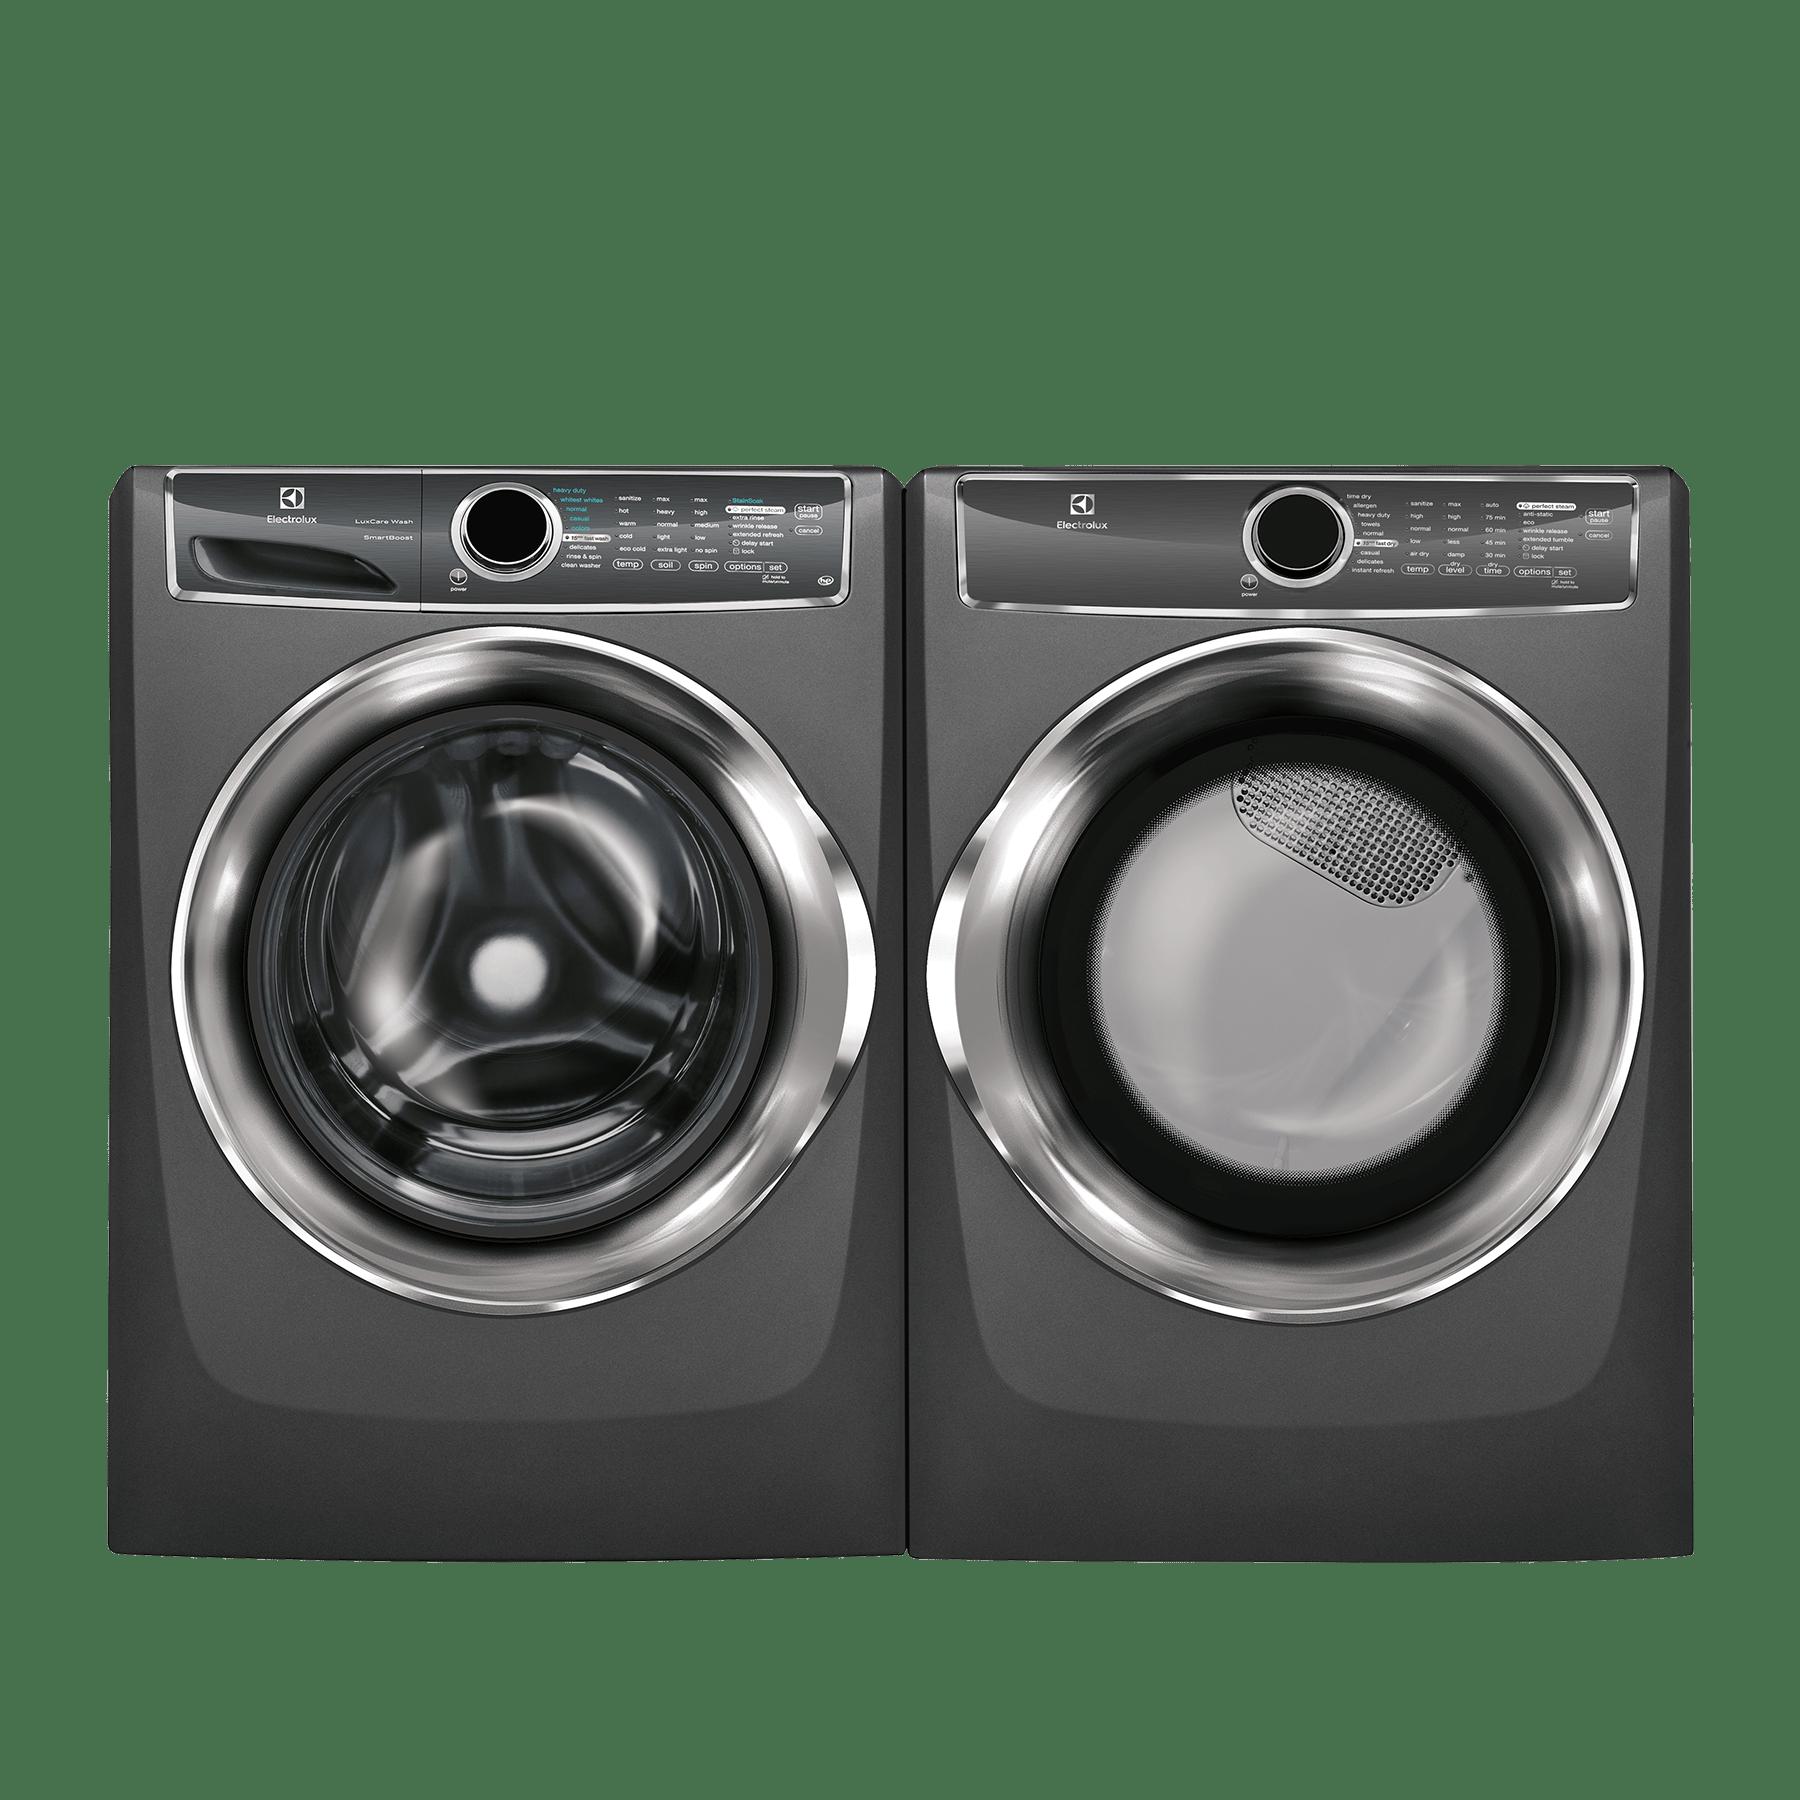 Electrolux Outdoor Kitchen: Electrolux Front Load Laundry Pair-Titanium